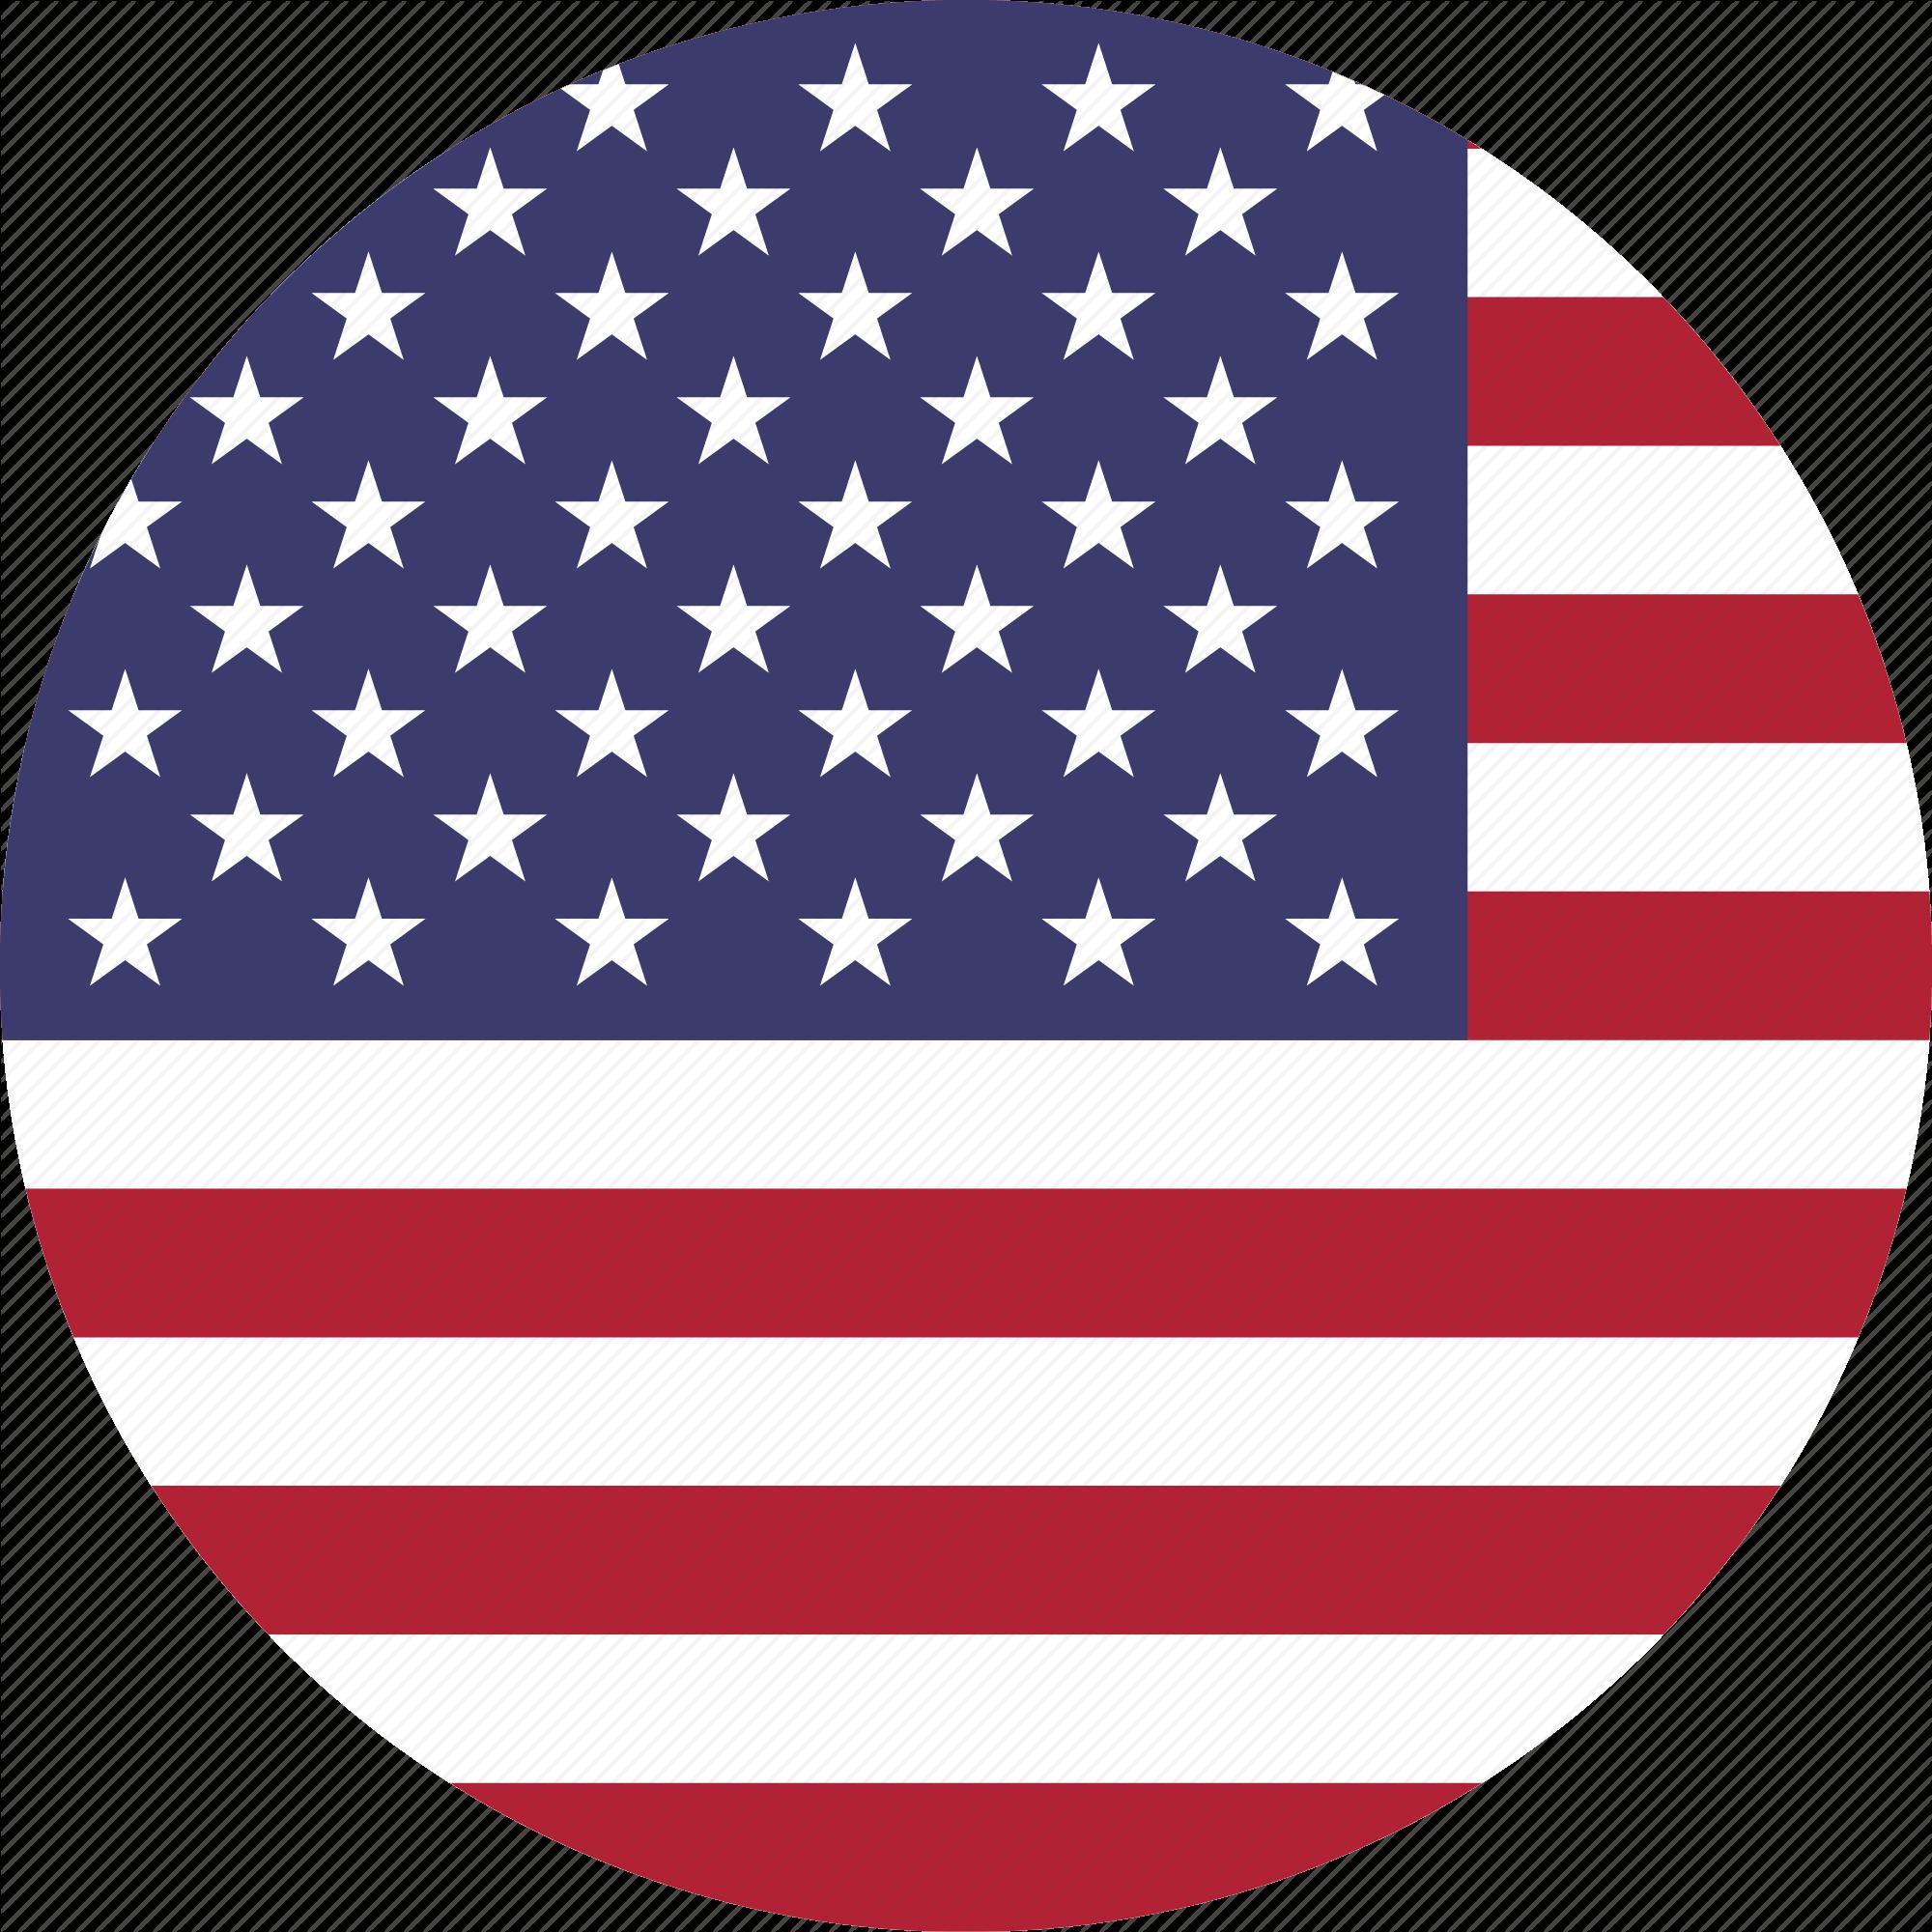 United states flag clip art clipart royalty free stock Image of USA Flag – Waving, GIF, PNG, Emoji | Flag Images clipart royalty free stock